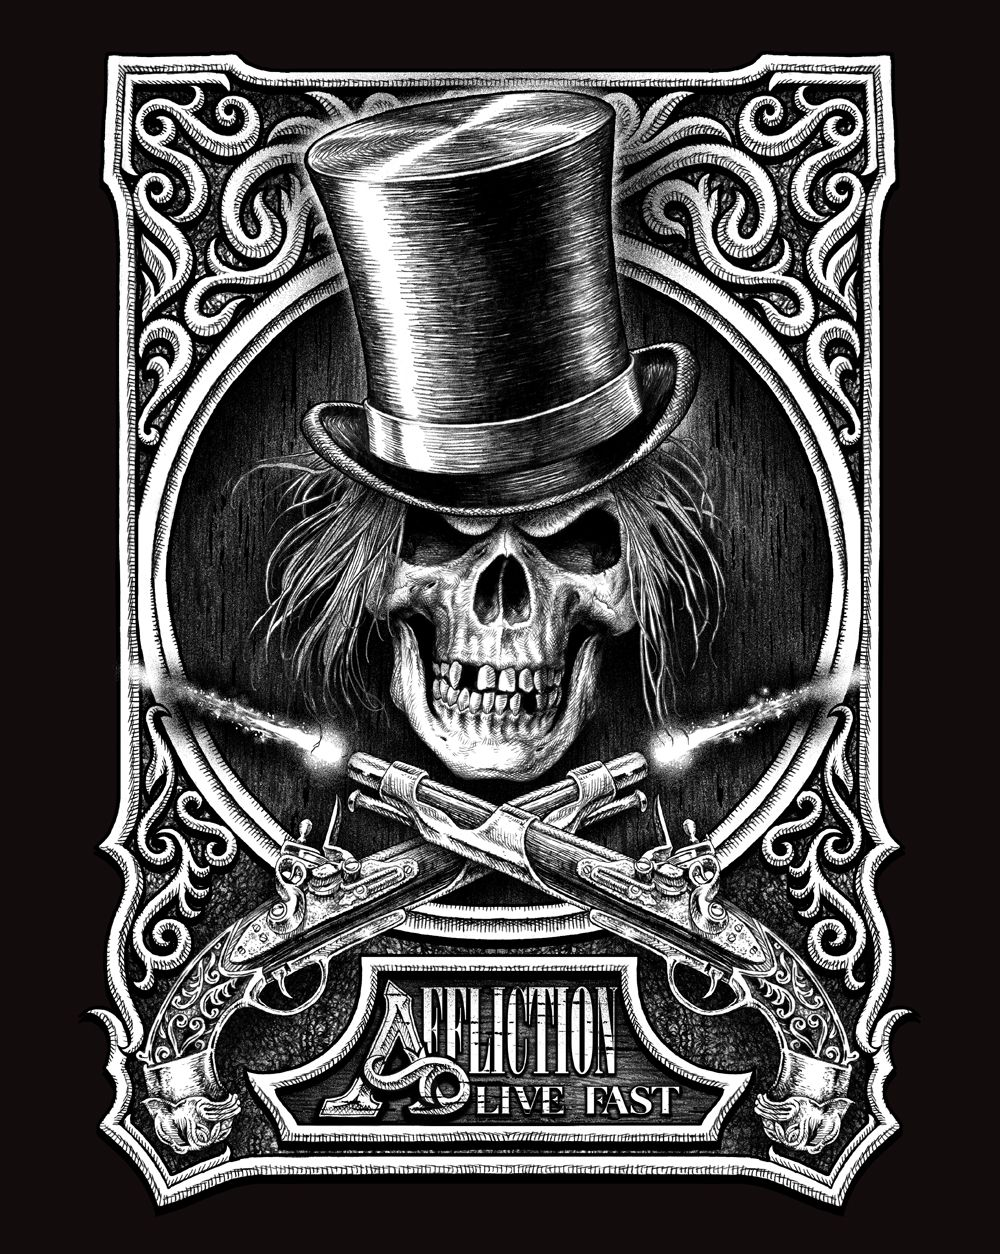 resultado de imagem para affliction t shirts skulls pinterest chicano skeleton anatomy. Black Bedroom Furniture Sets. Home Design Ideas